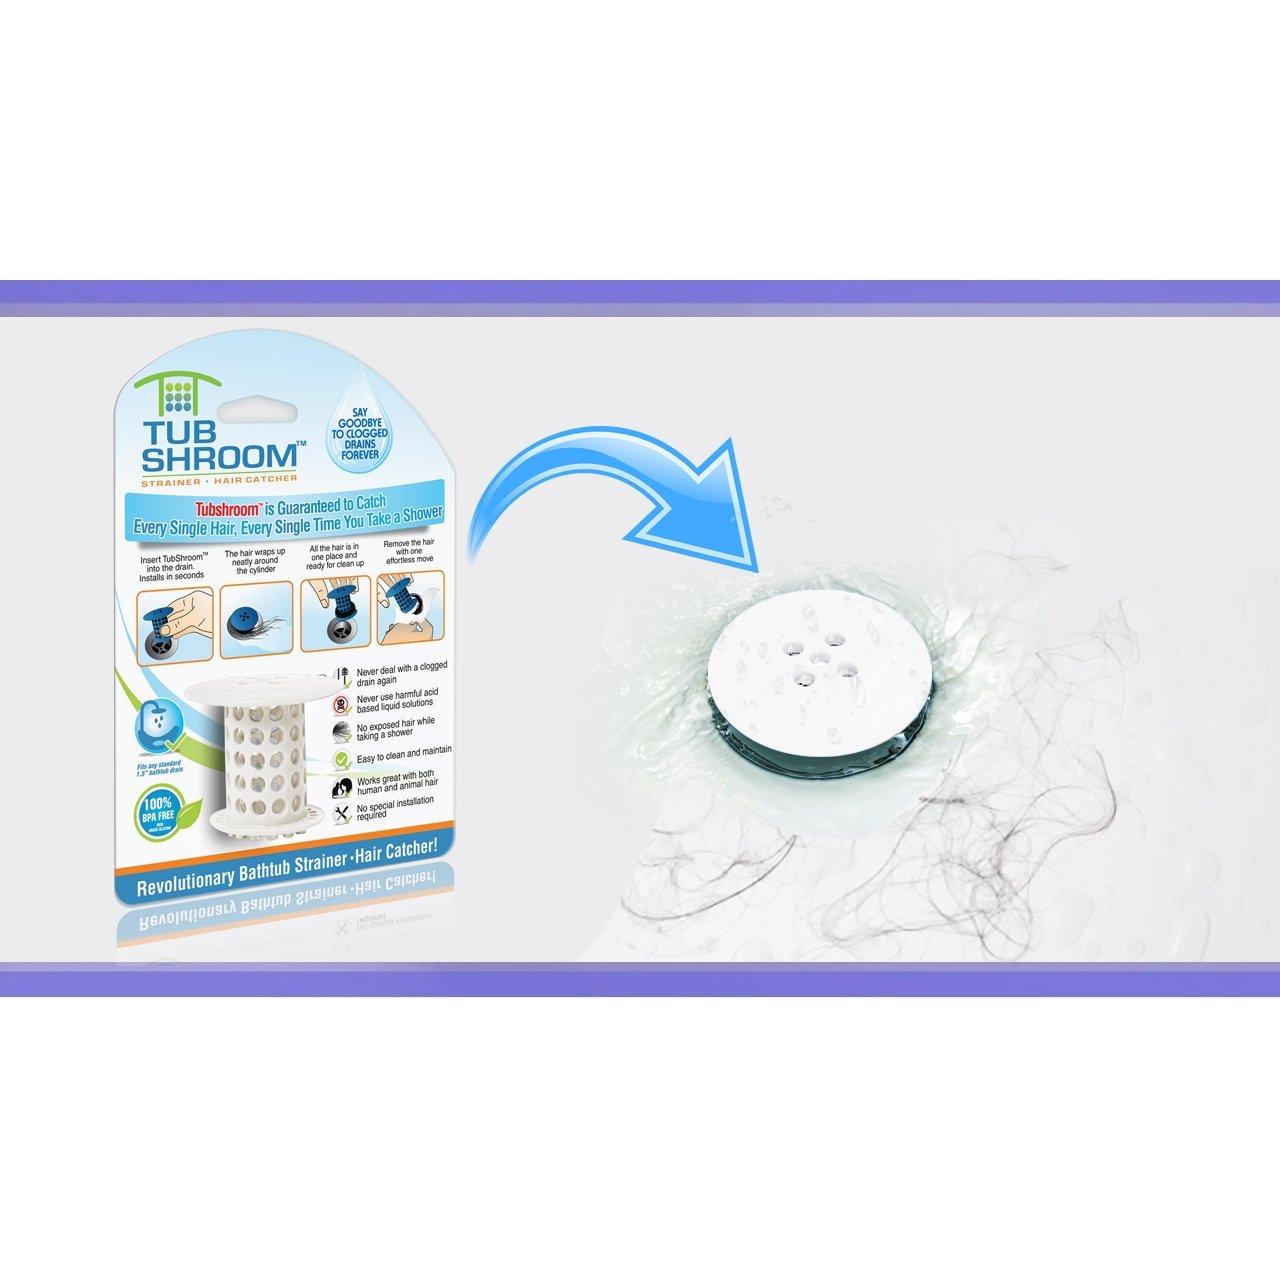 TubShroom TSWHT454 The Revolutionary Tub Drain Protector Hair  Catcher/Strainer/Snare, White: Amazon.ca: Home U0026 Kitchen